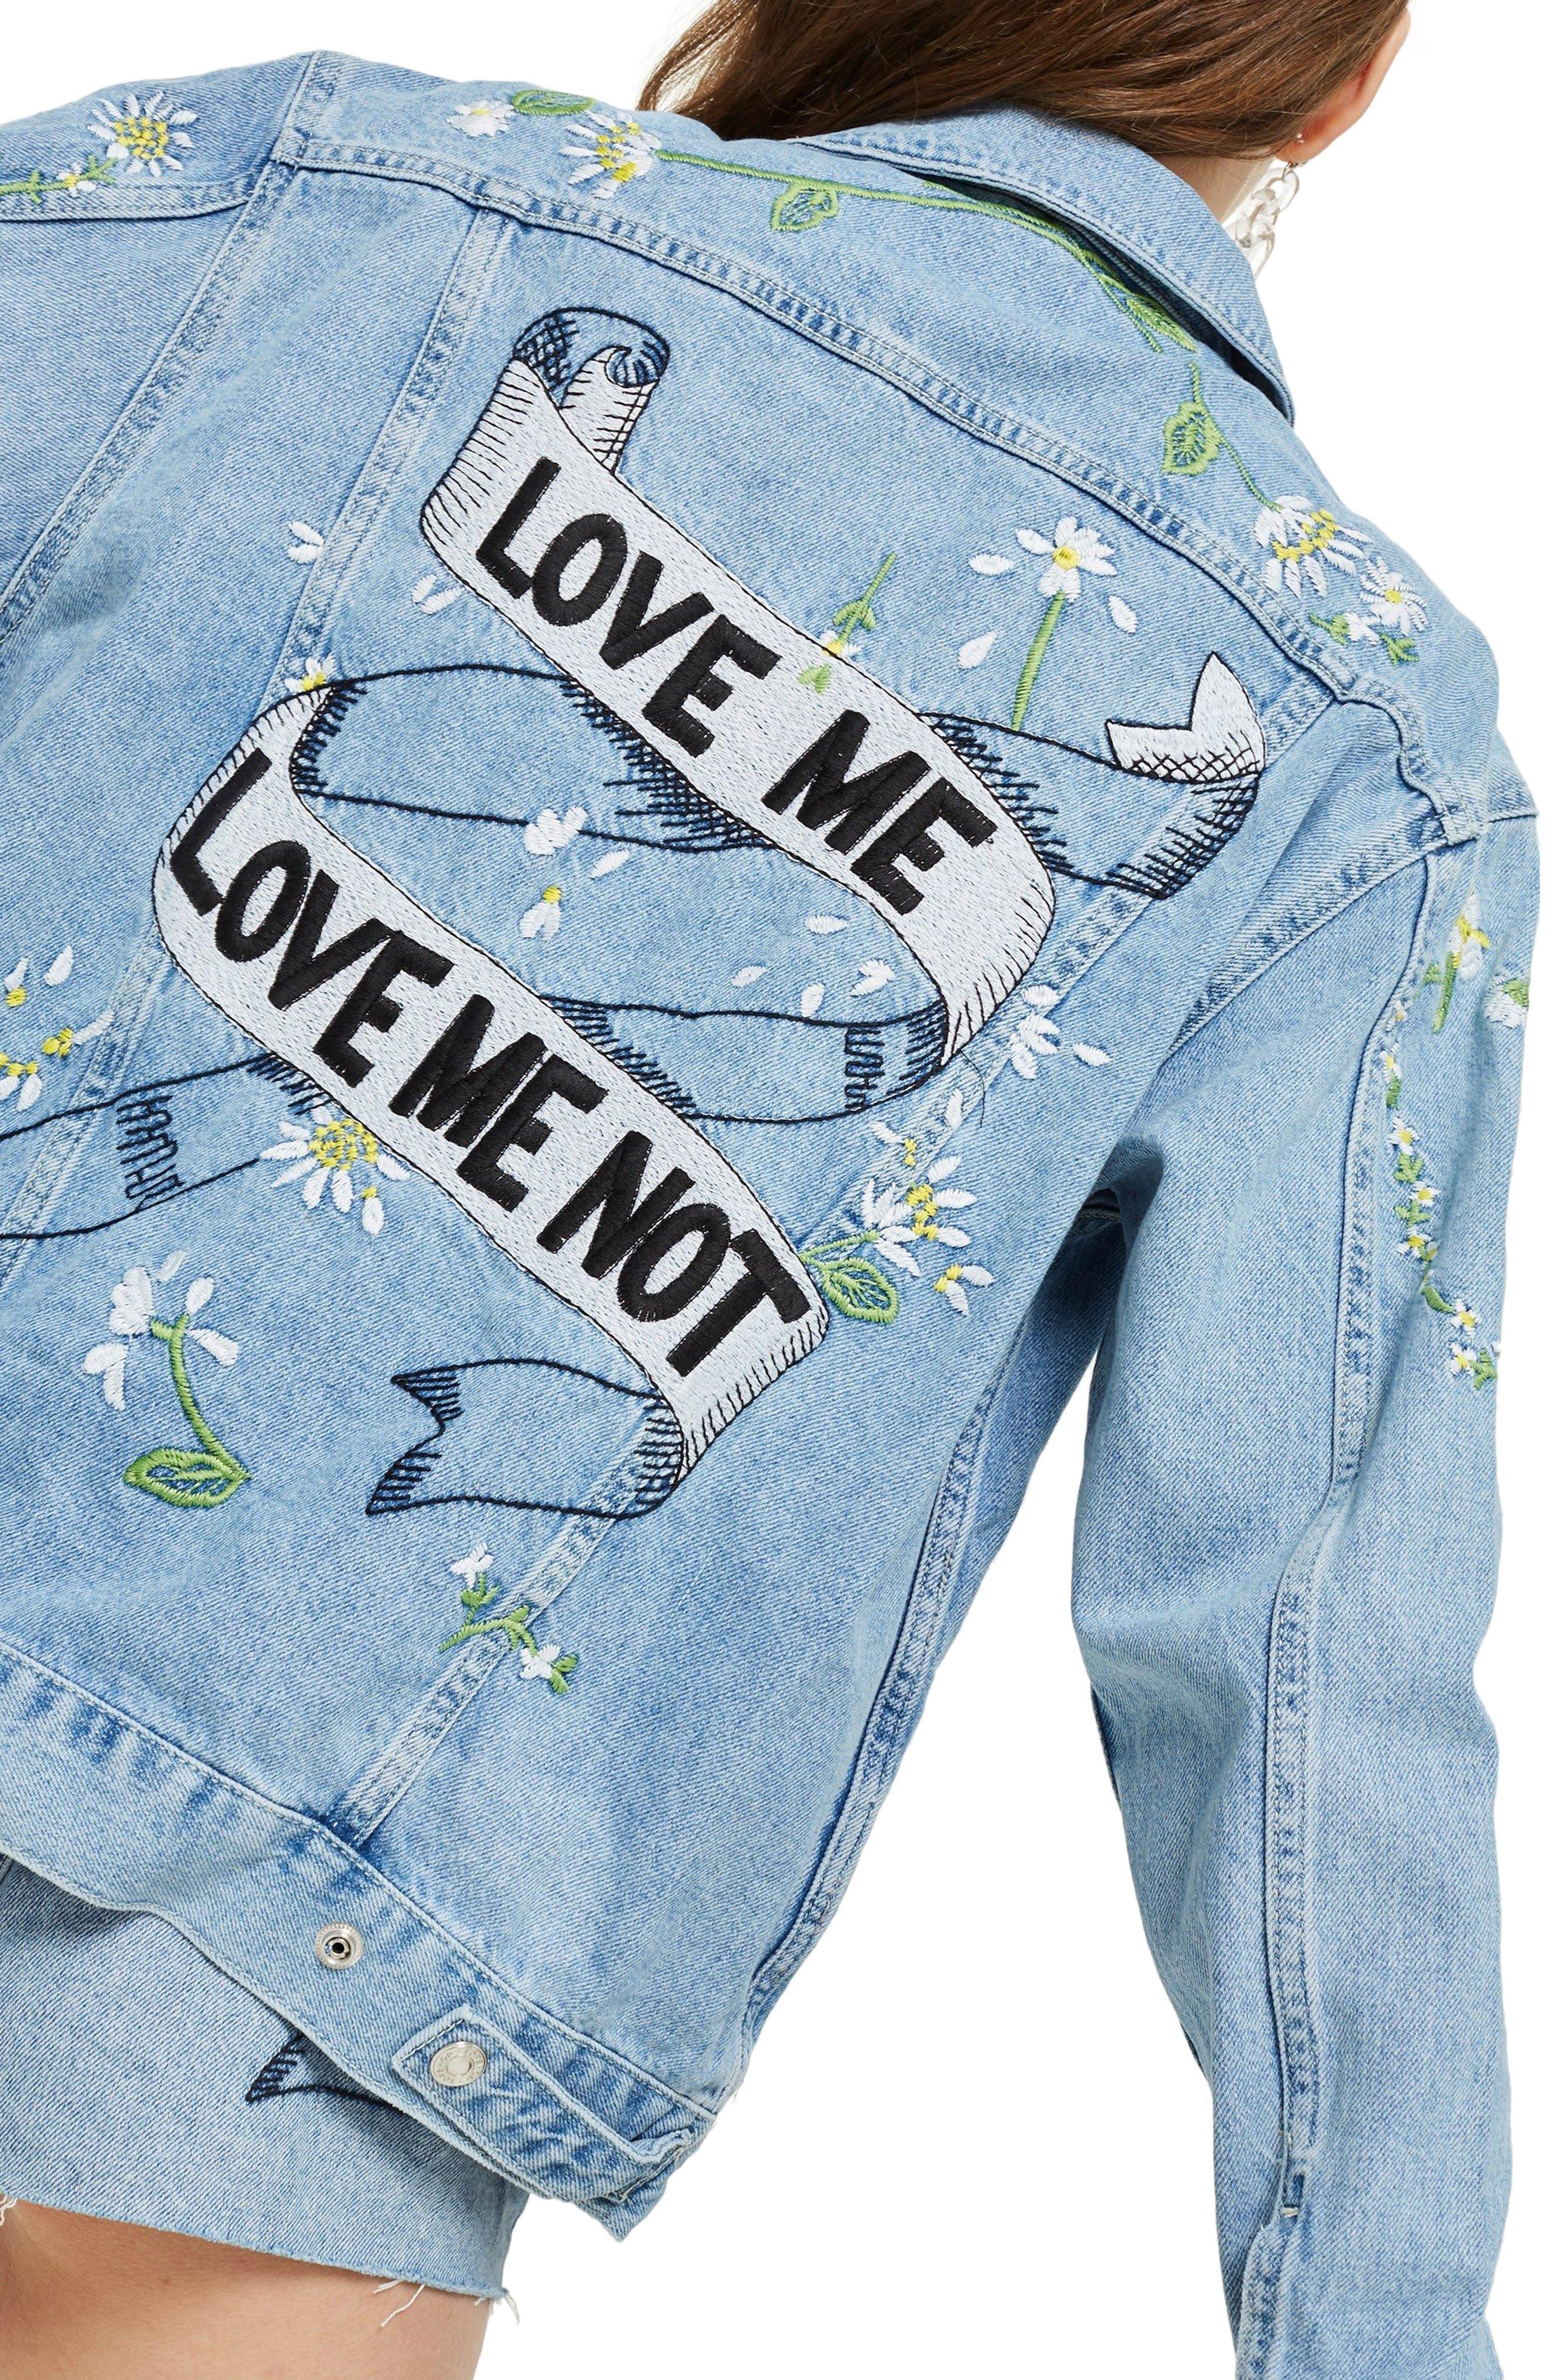 Love Me Not Embroidered Denim Jacket,                             Alternate thumbnail 2, color,                             420